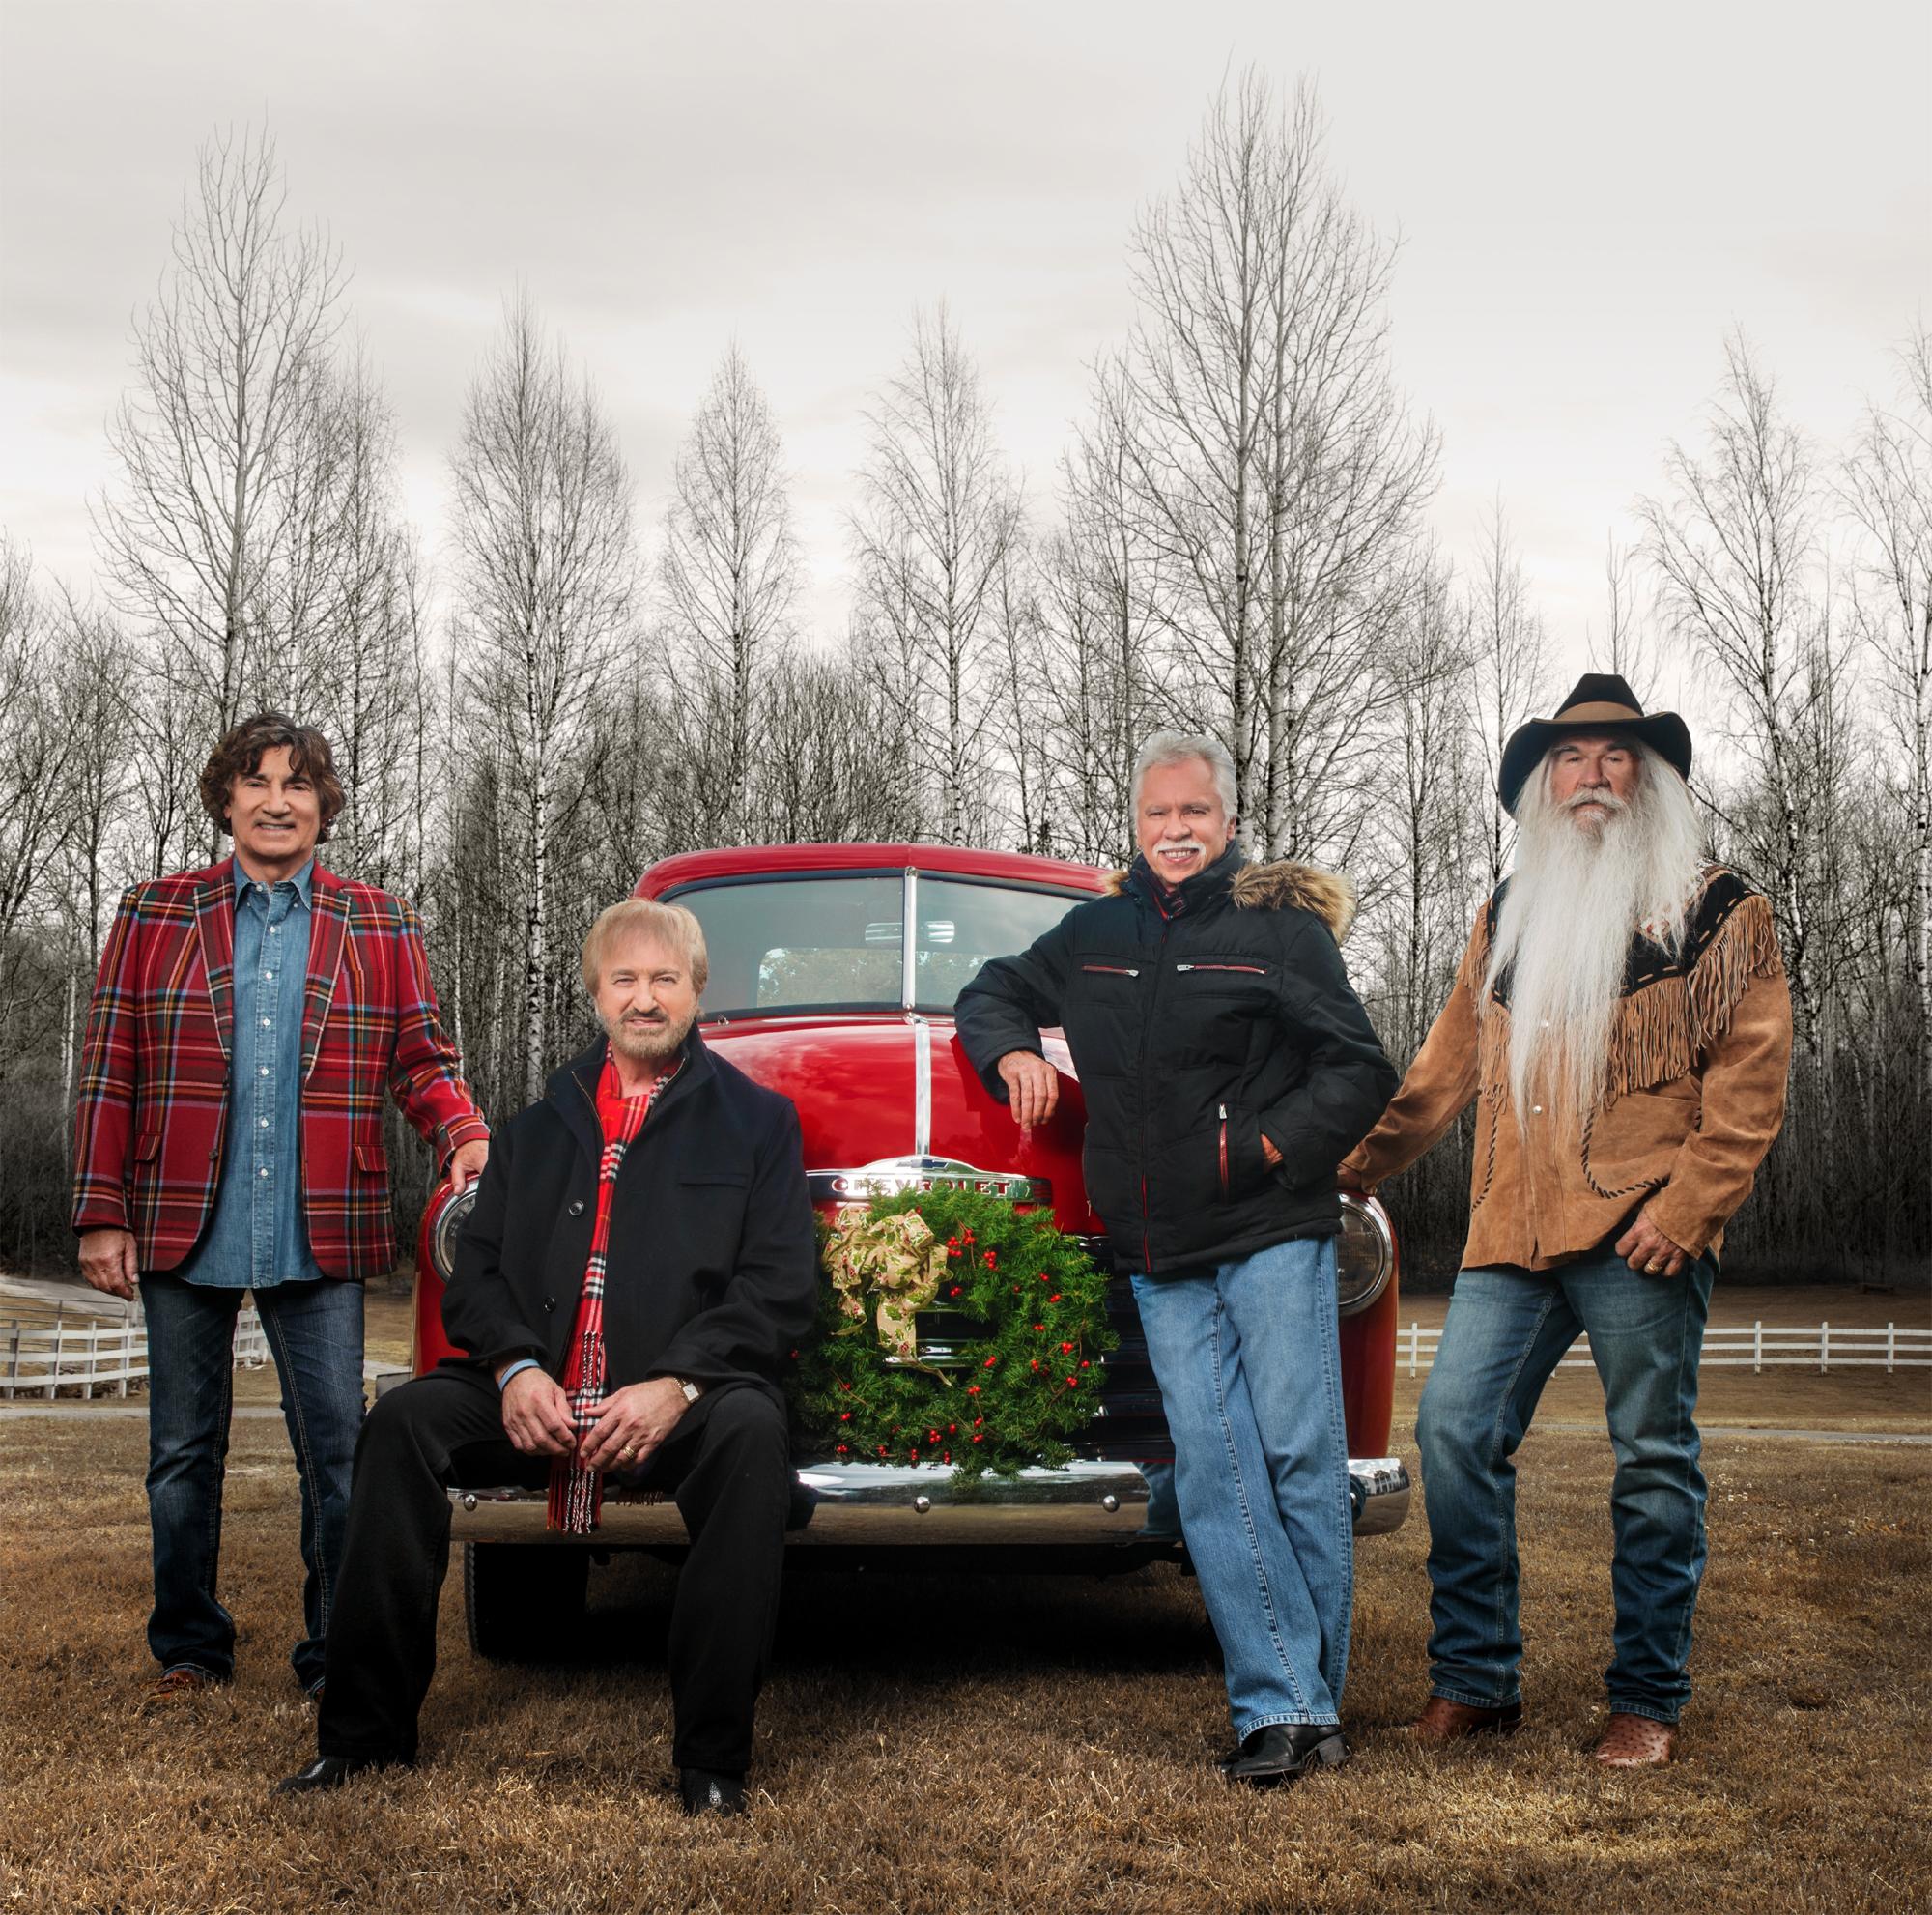 Oak Ridge Boys 'Celebrate Christmas' at Kirby Center in Wilkes ...